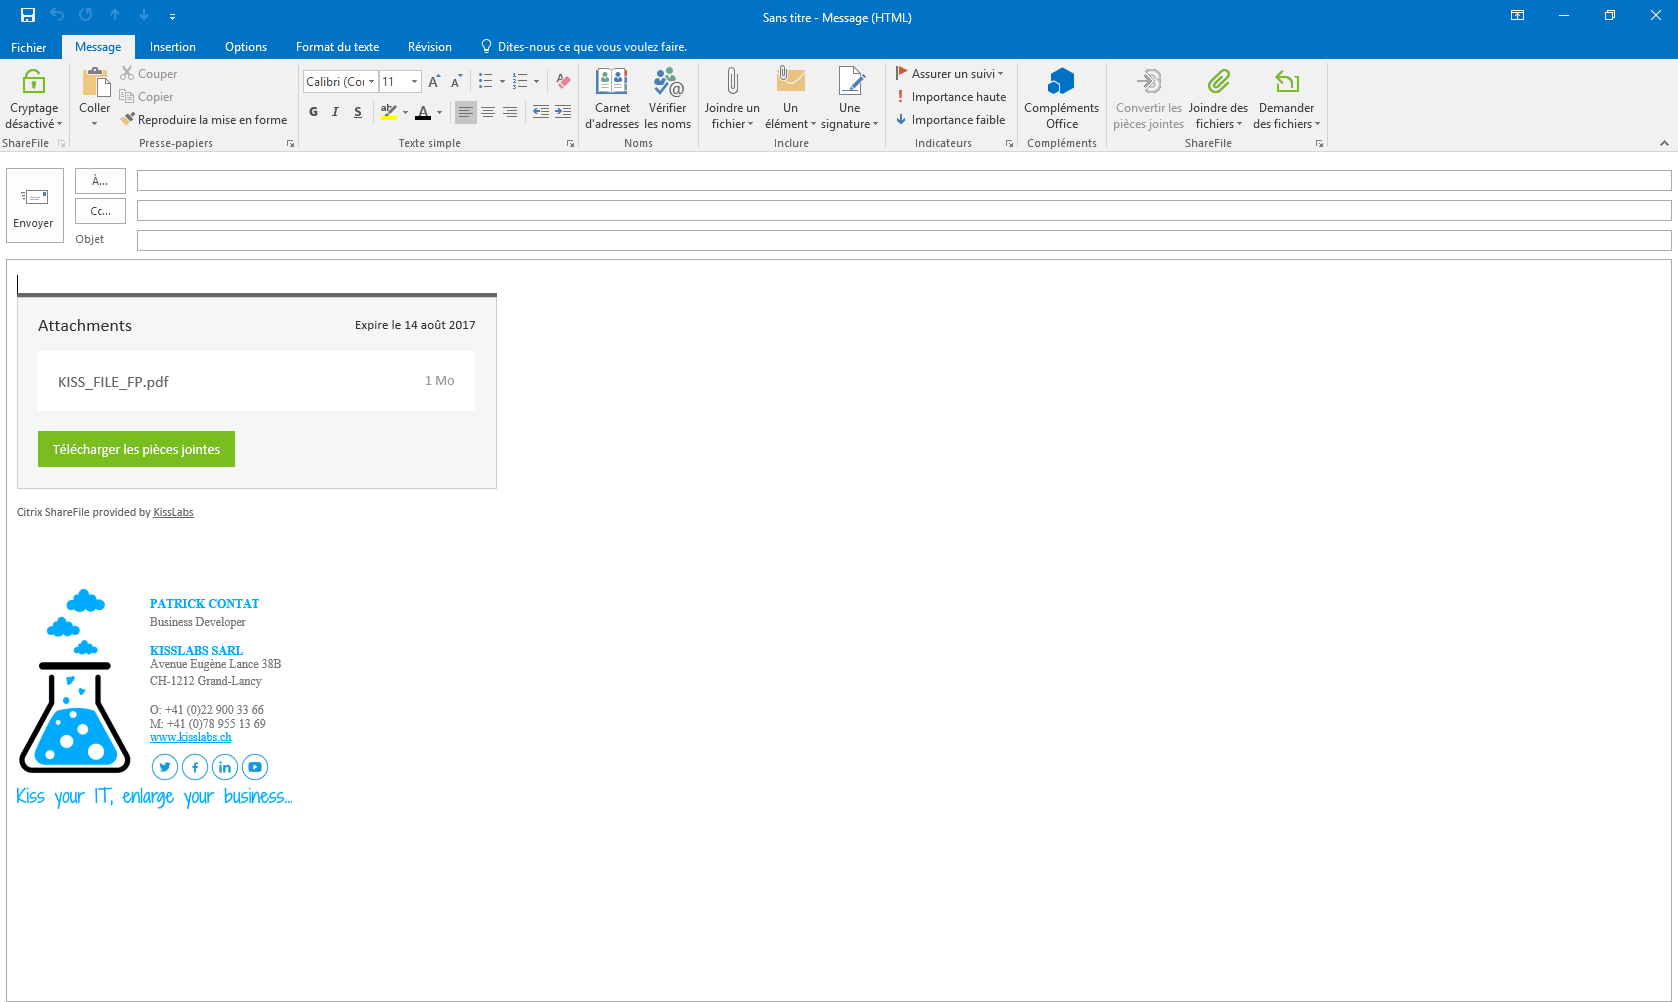 KissFile - Citrix ShareFile - Joindre fichier via Outlook